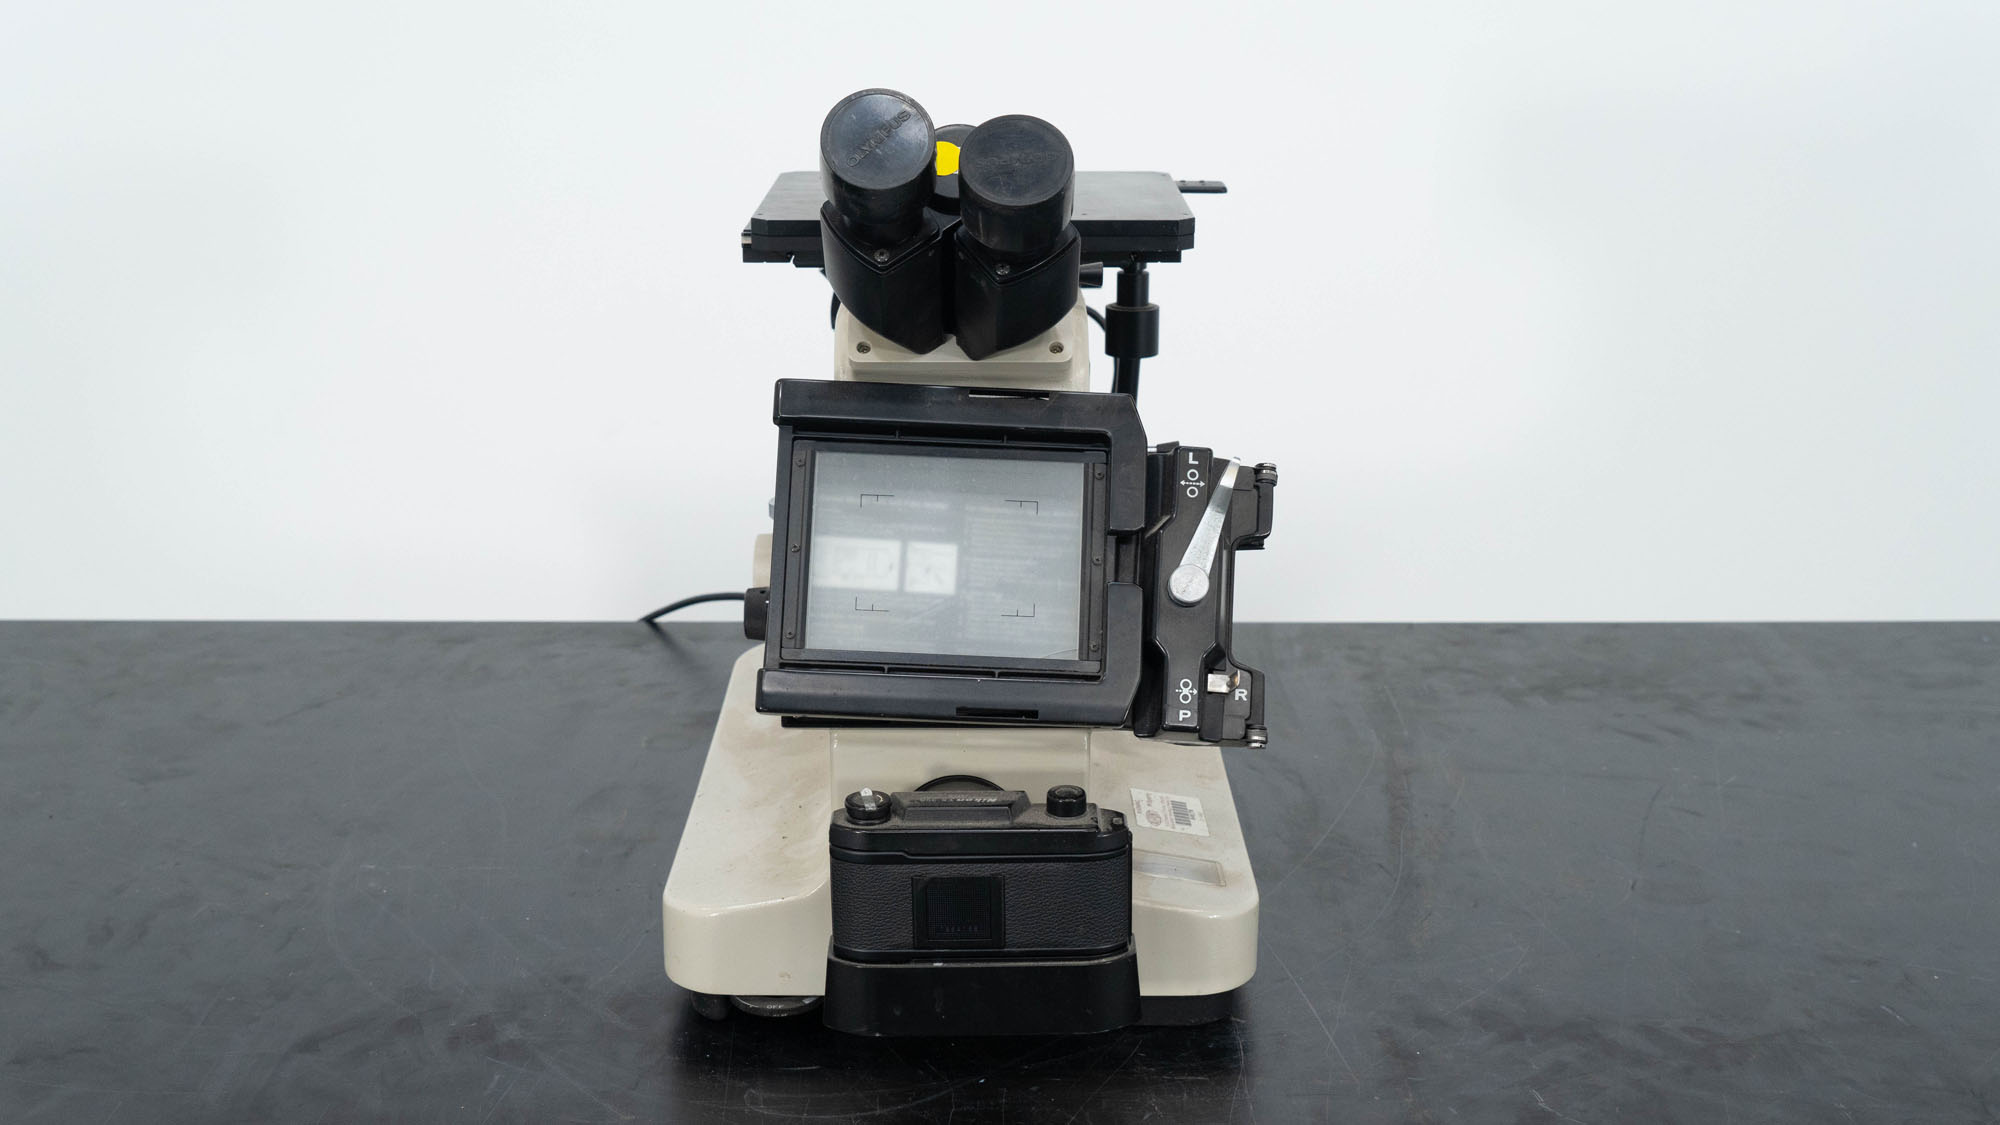 Nikon Microscope, Model Epiphot